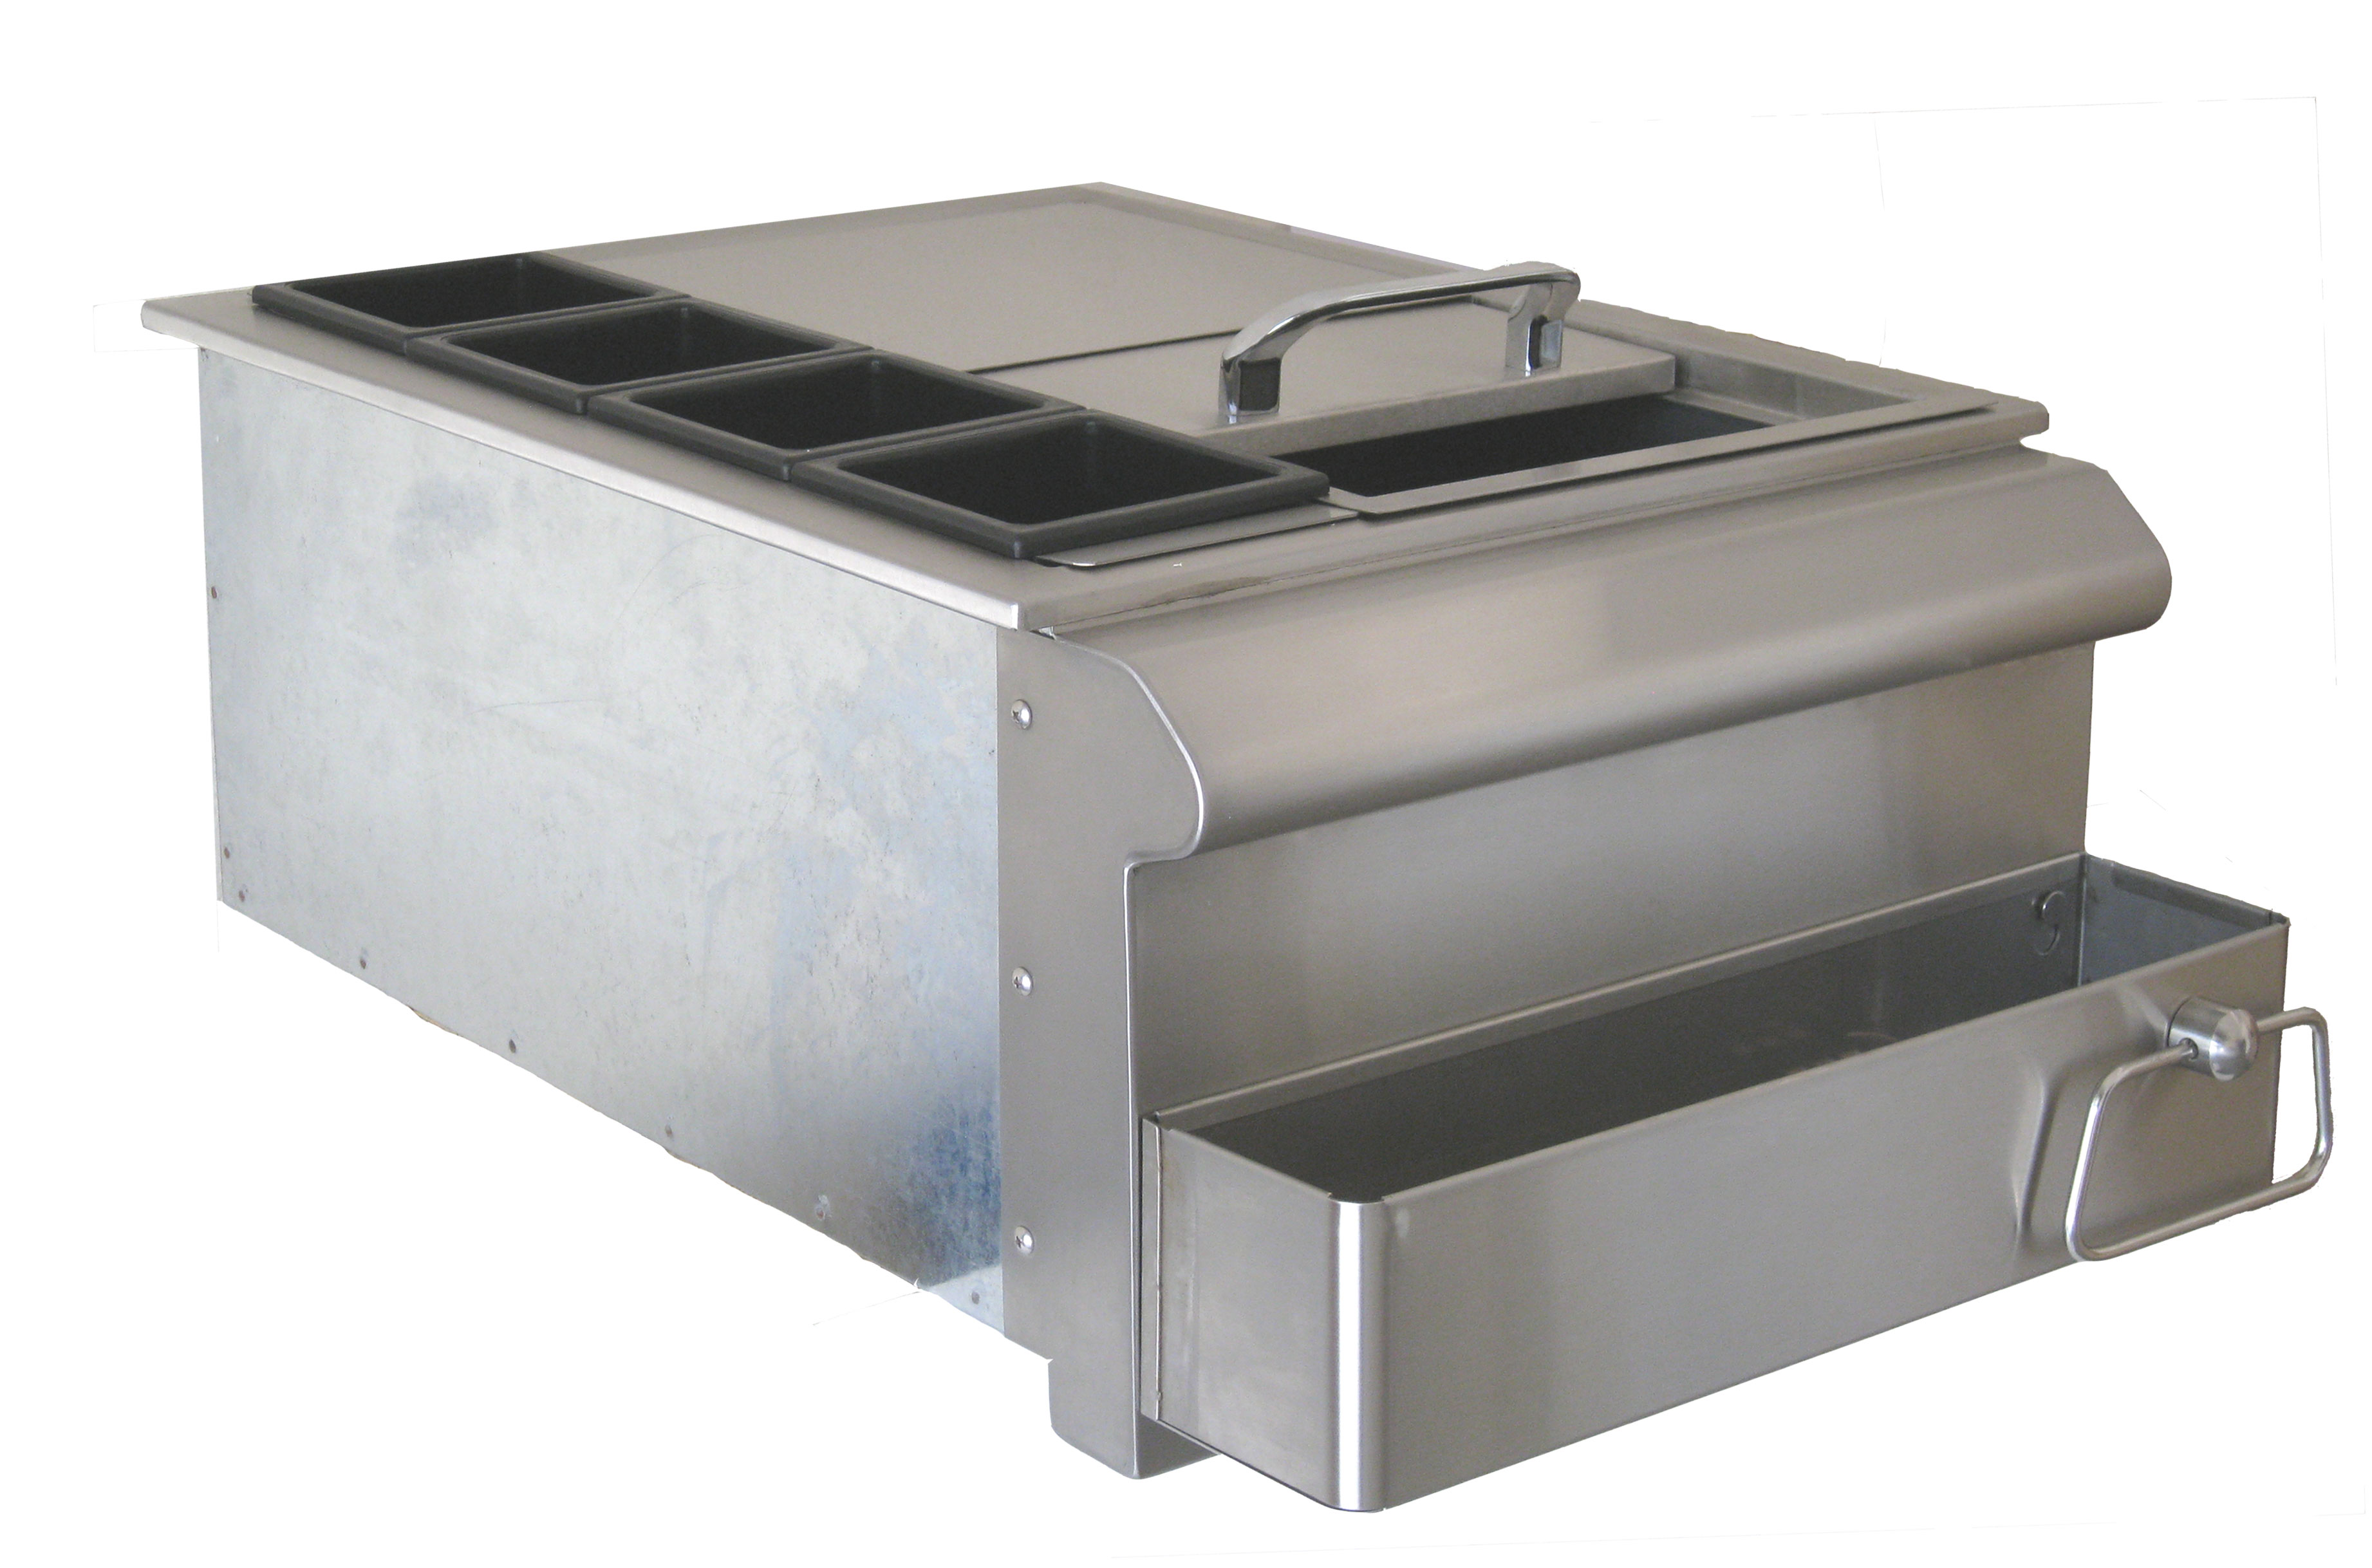 25200-stainless-steel-18-inch-bar-centre.jpg